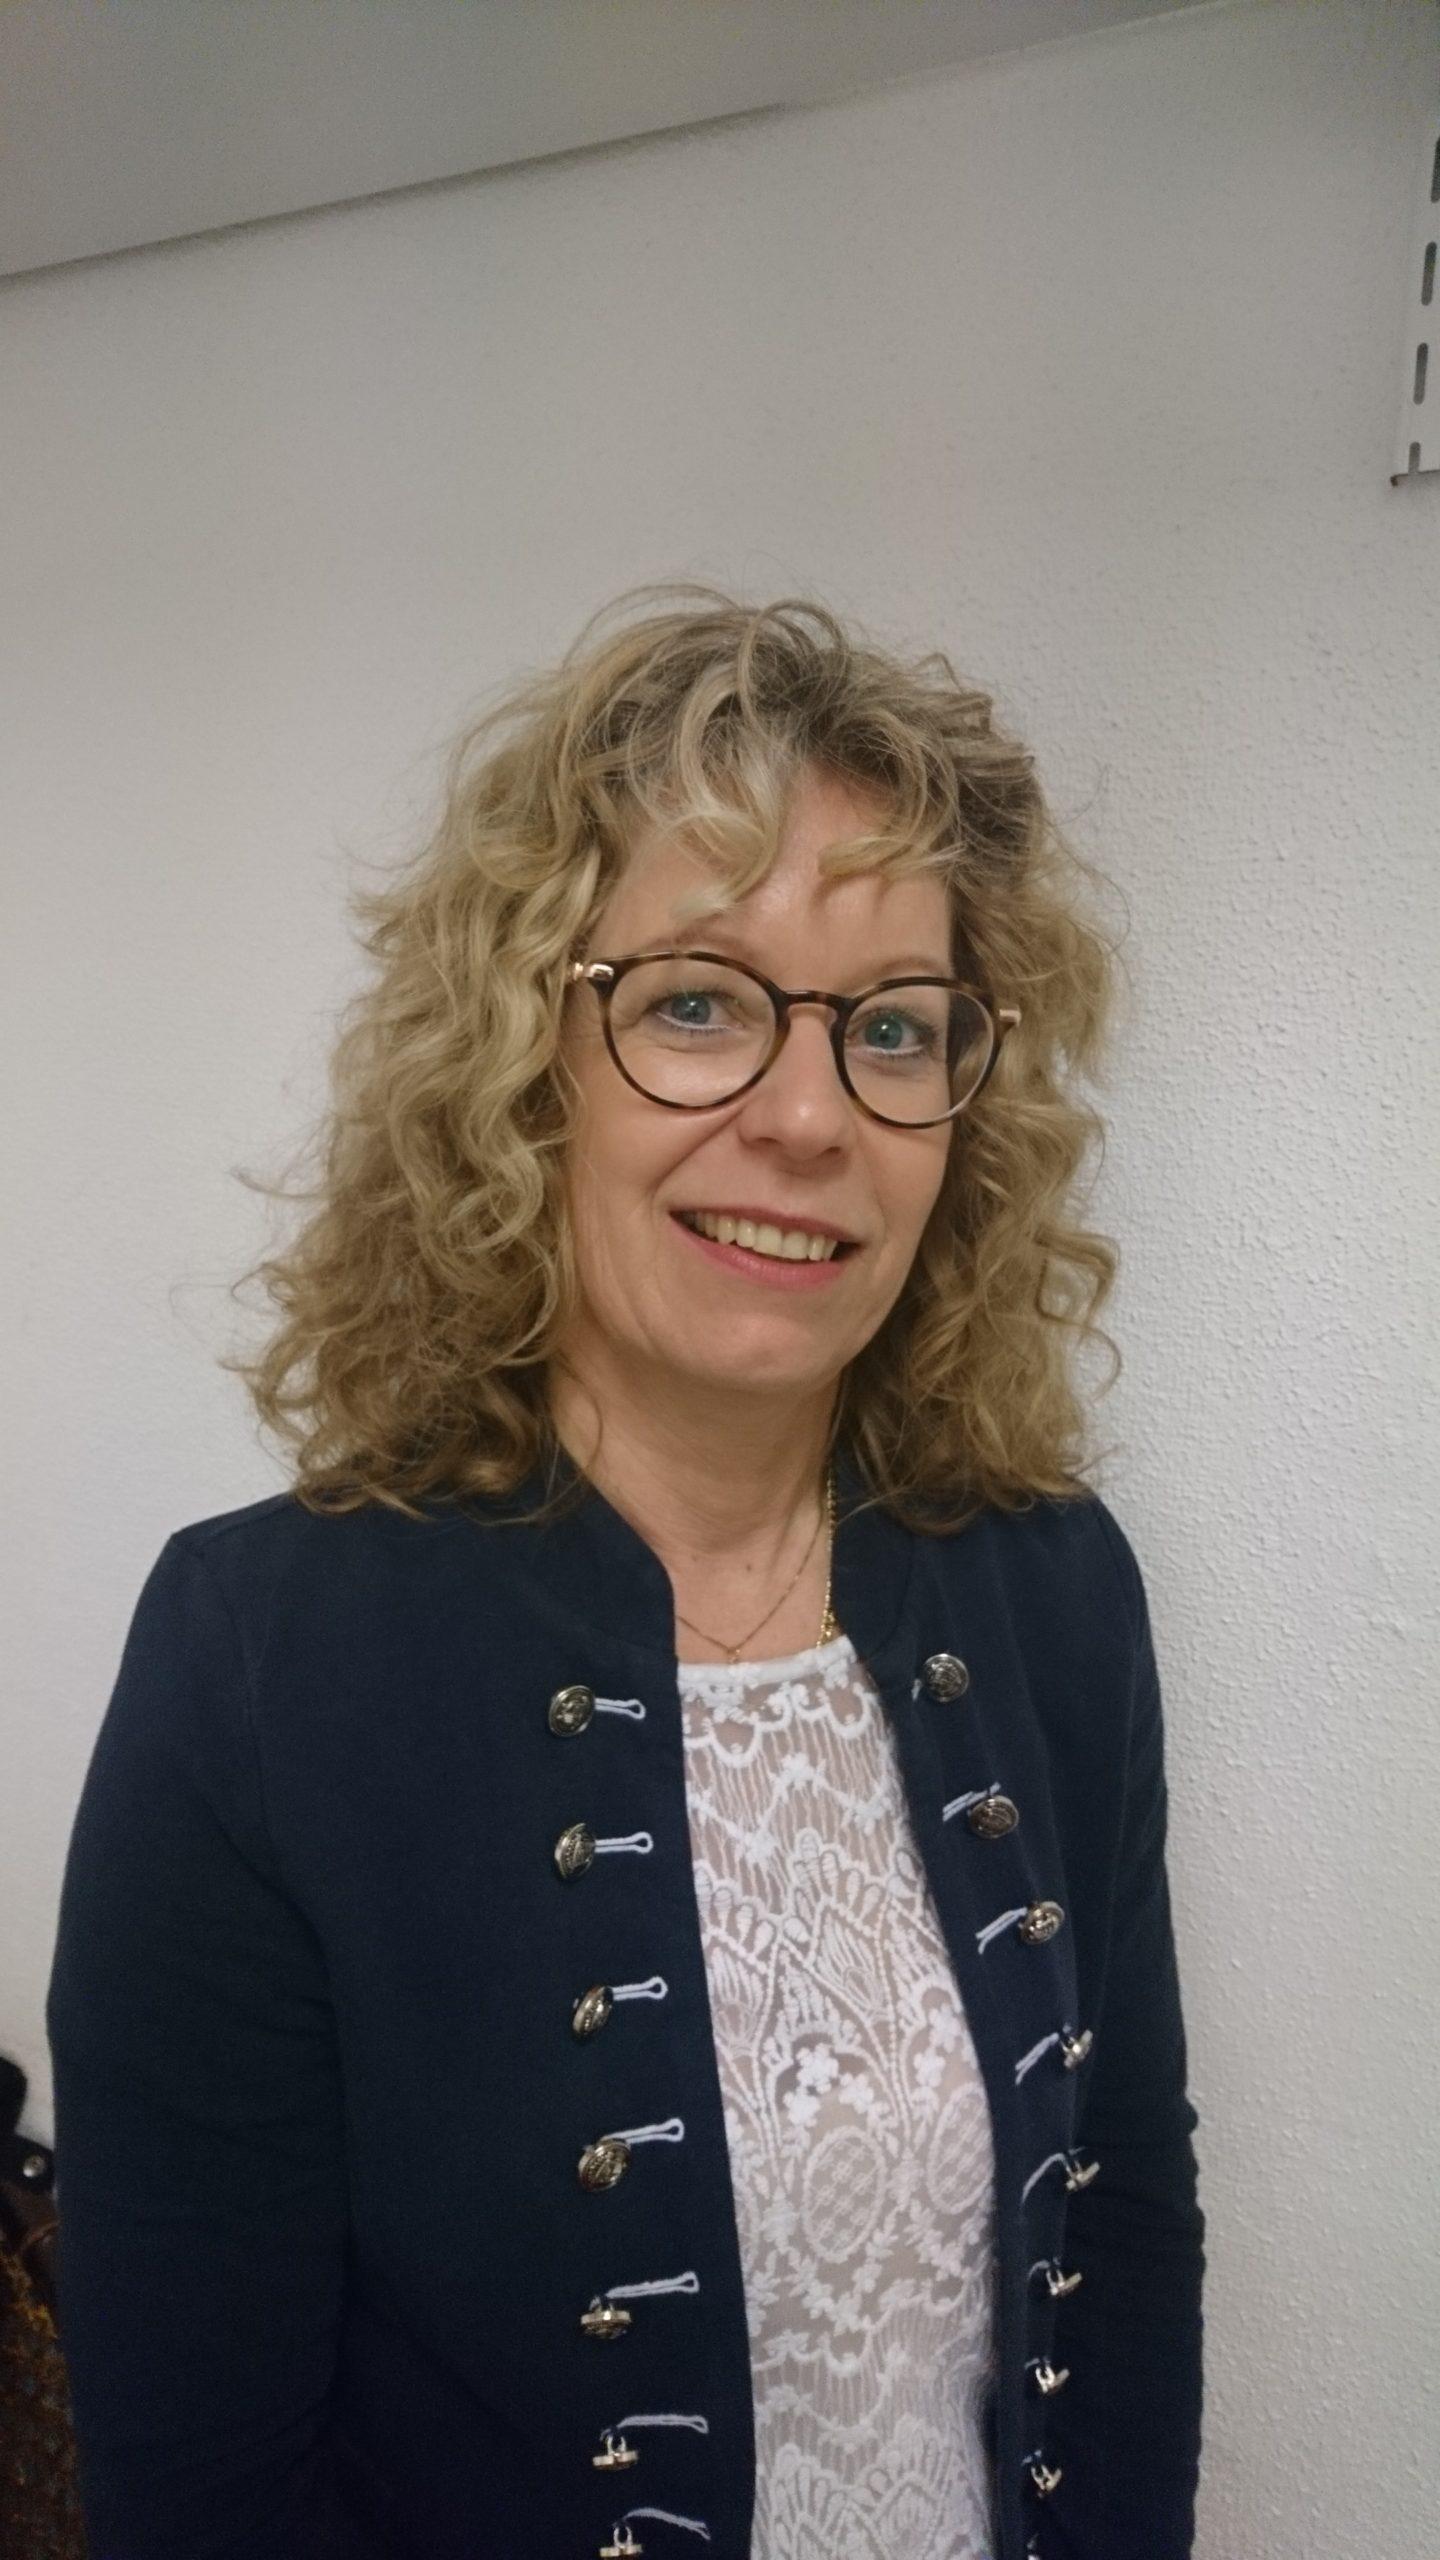 Kristina Henriksson